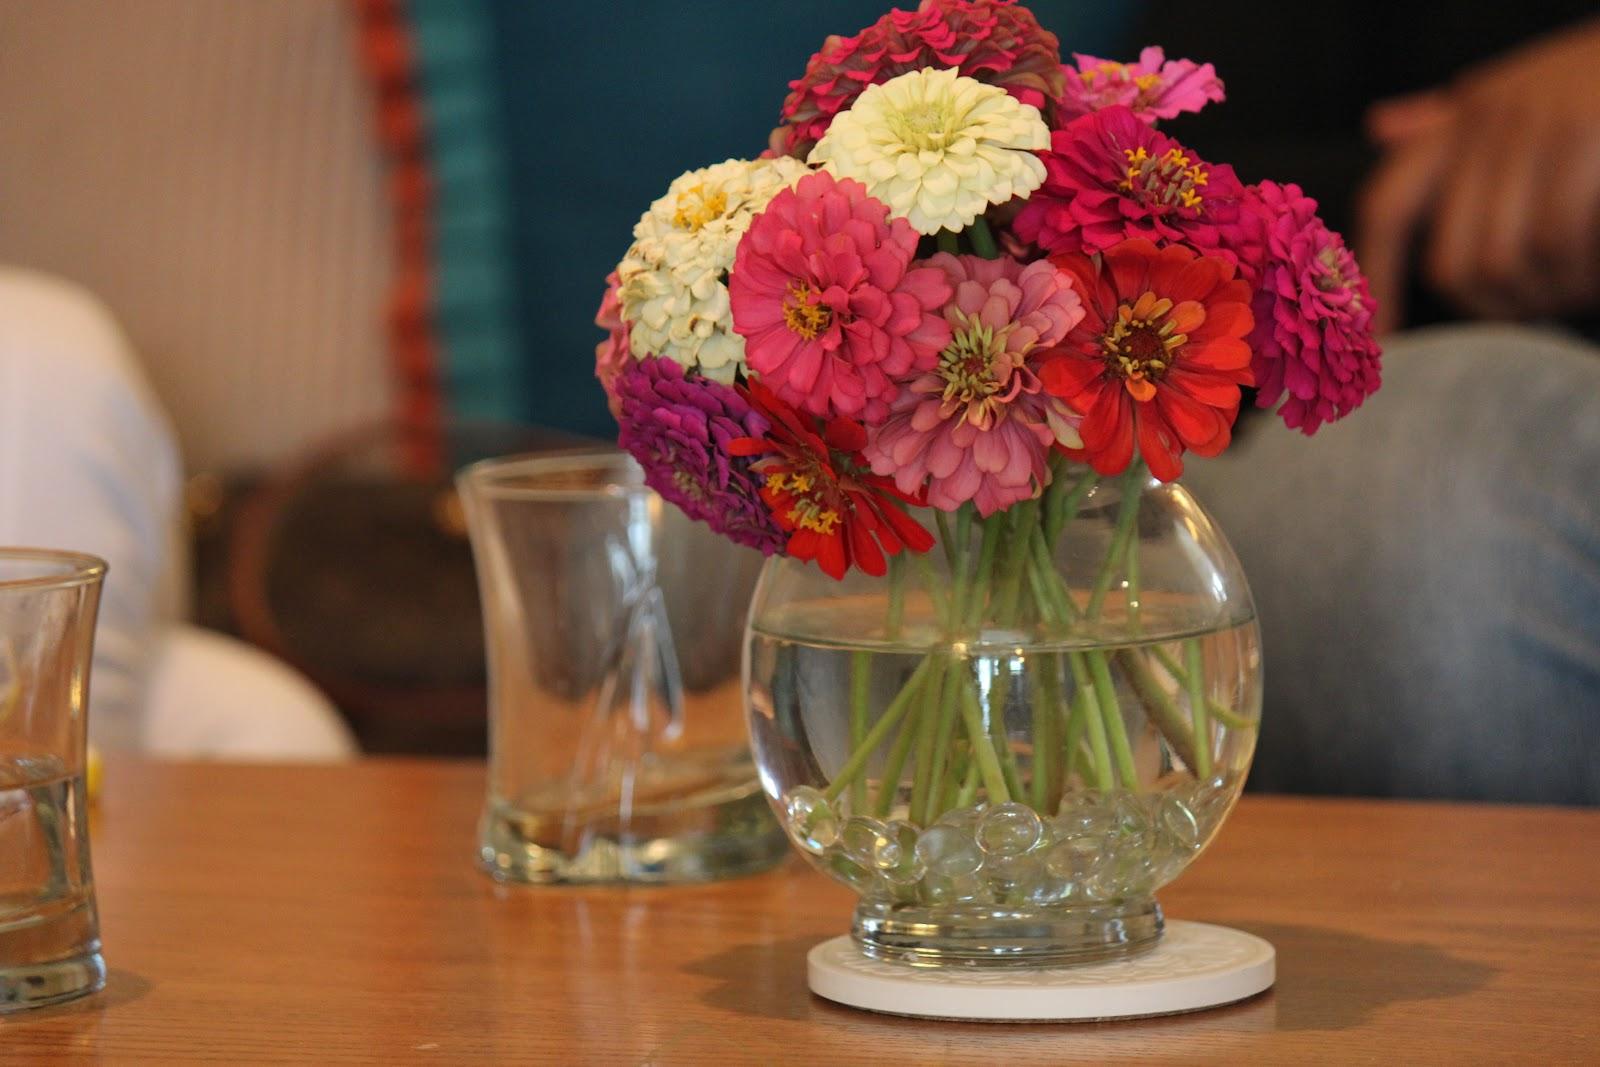 Keep Cut Flowers Fresh: Snapdragon Bouquet -